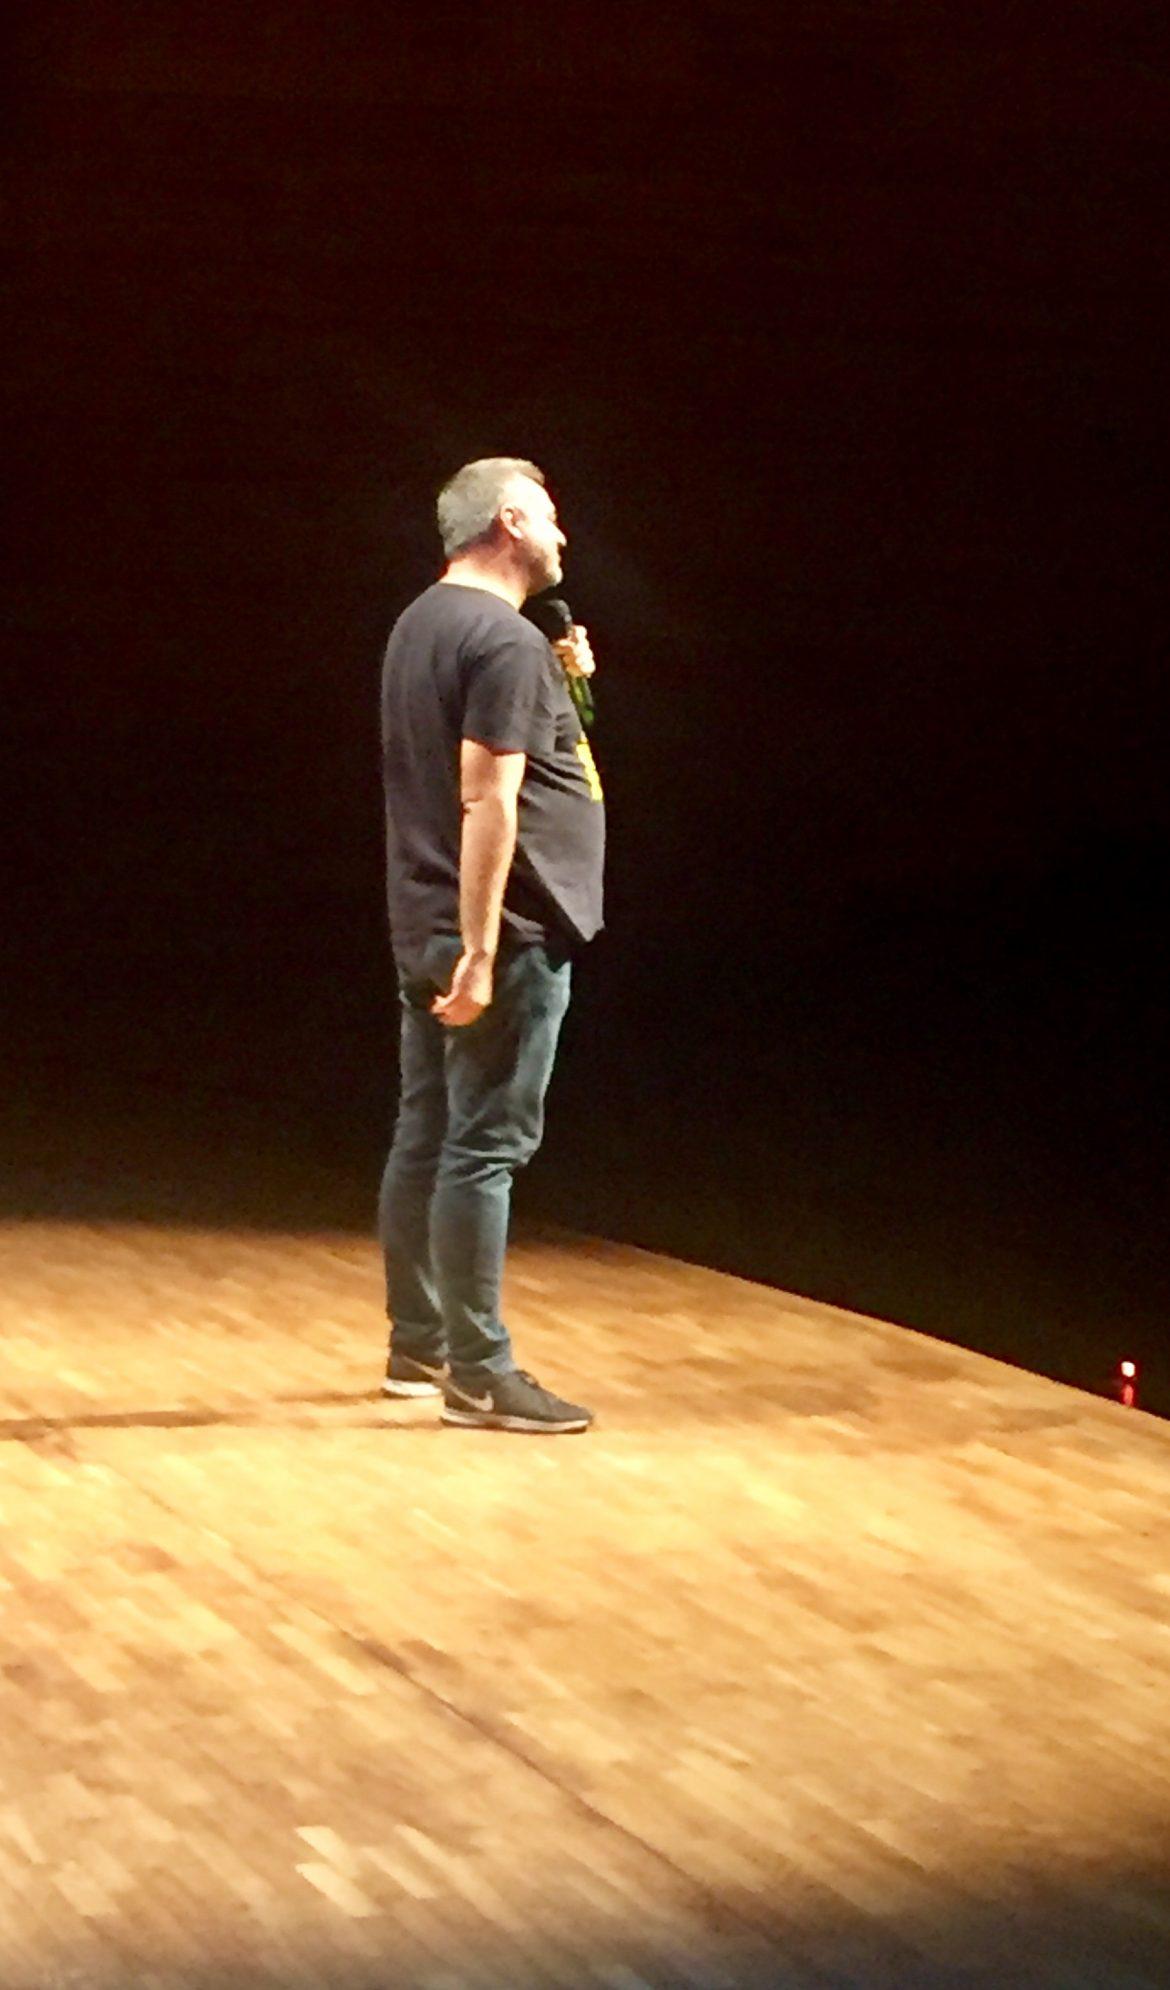 Comikazes en Albacete - La Gira de los Comikazes - Morirán con las risas puestas - Comikazes - Juan Solo - Iñaki Urrutia - Alfredo Díaz - Paco Calavera - Albacete - Auditorio de Albacete - Banzai